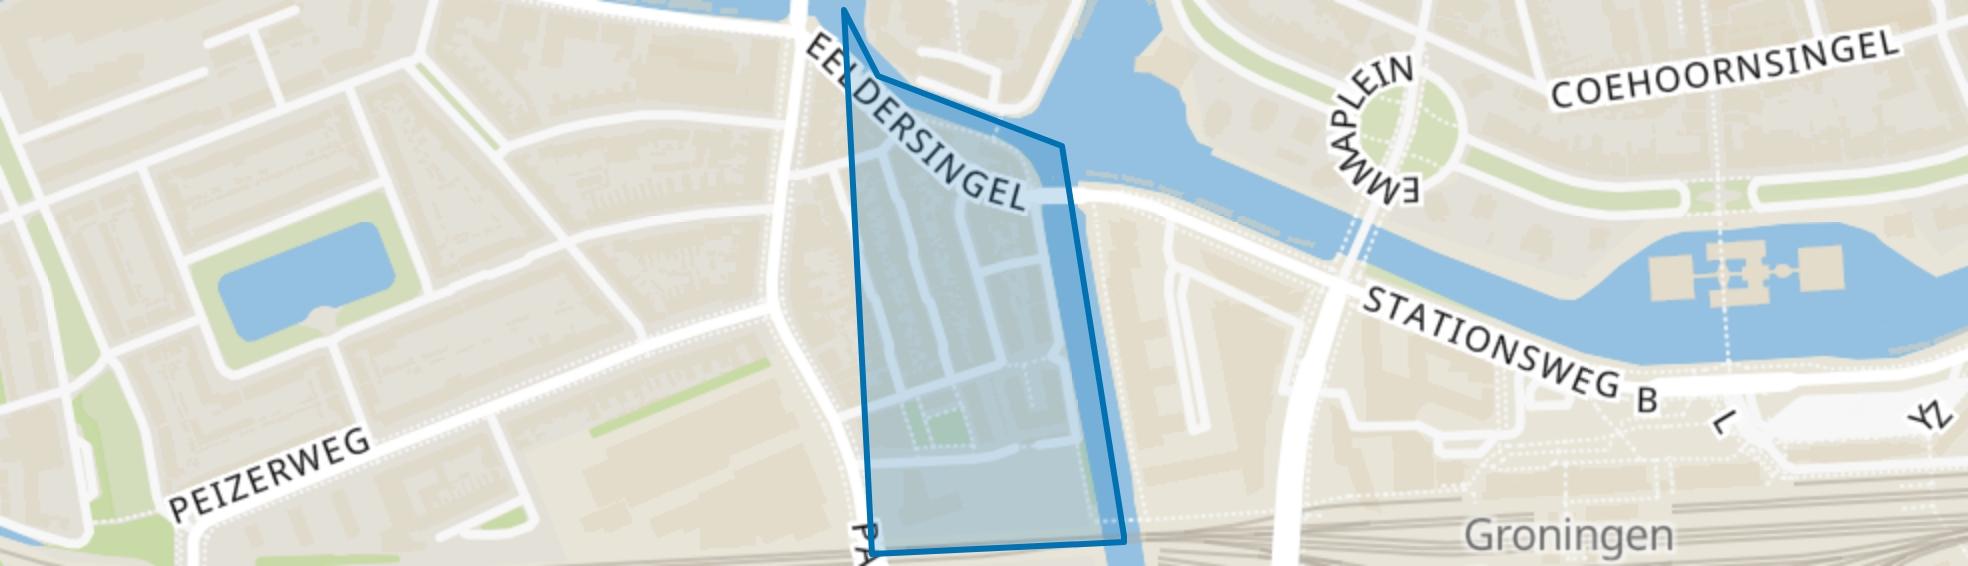 Badstratenbuurt, Groningen map